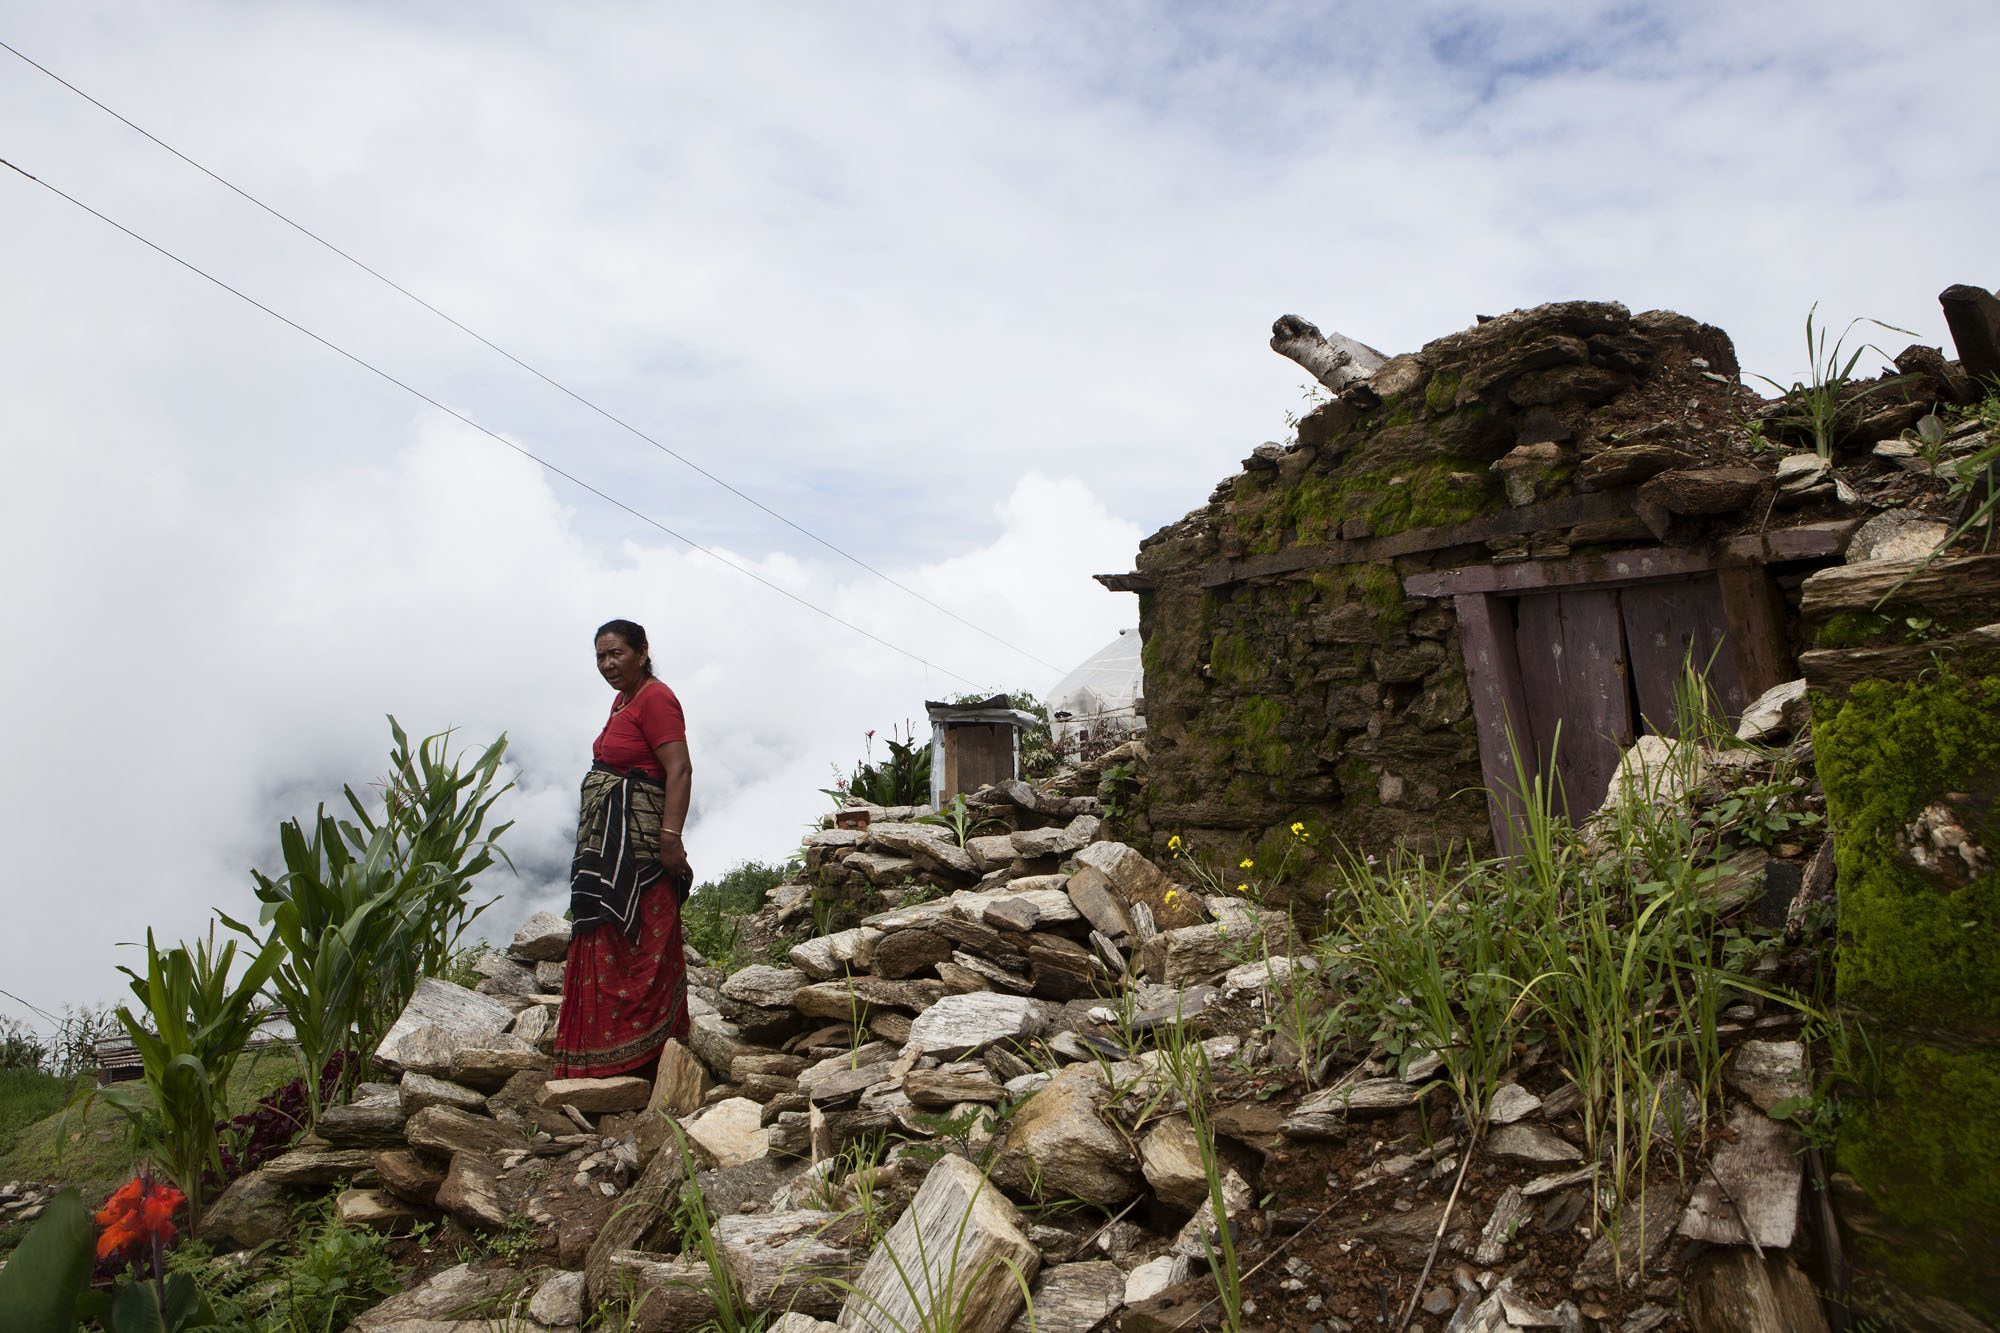 A Villager stands amongst rubble. Tauthali Village, Sindupalchowk District, Nepal. August 5, 2015.